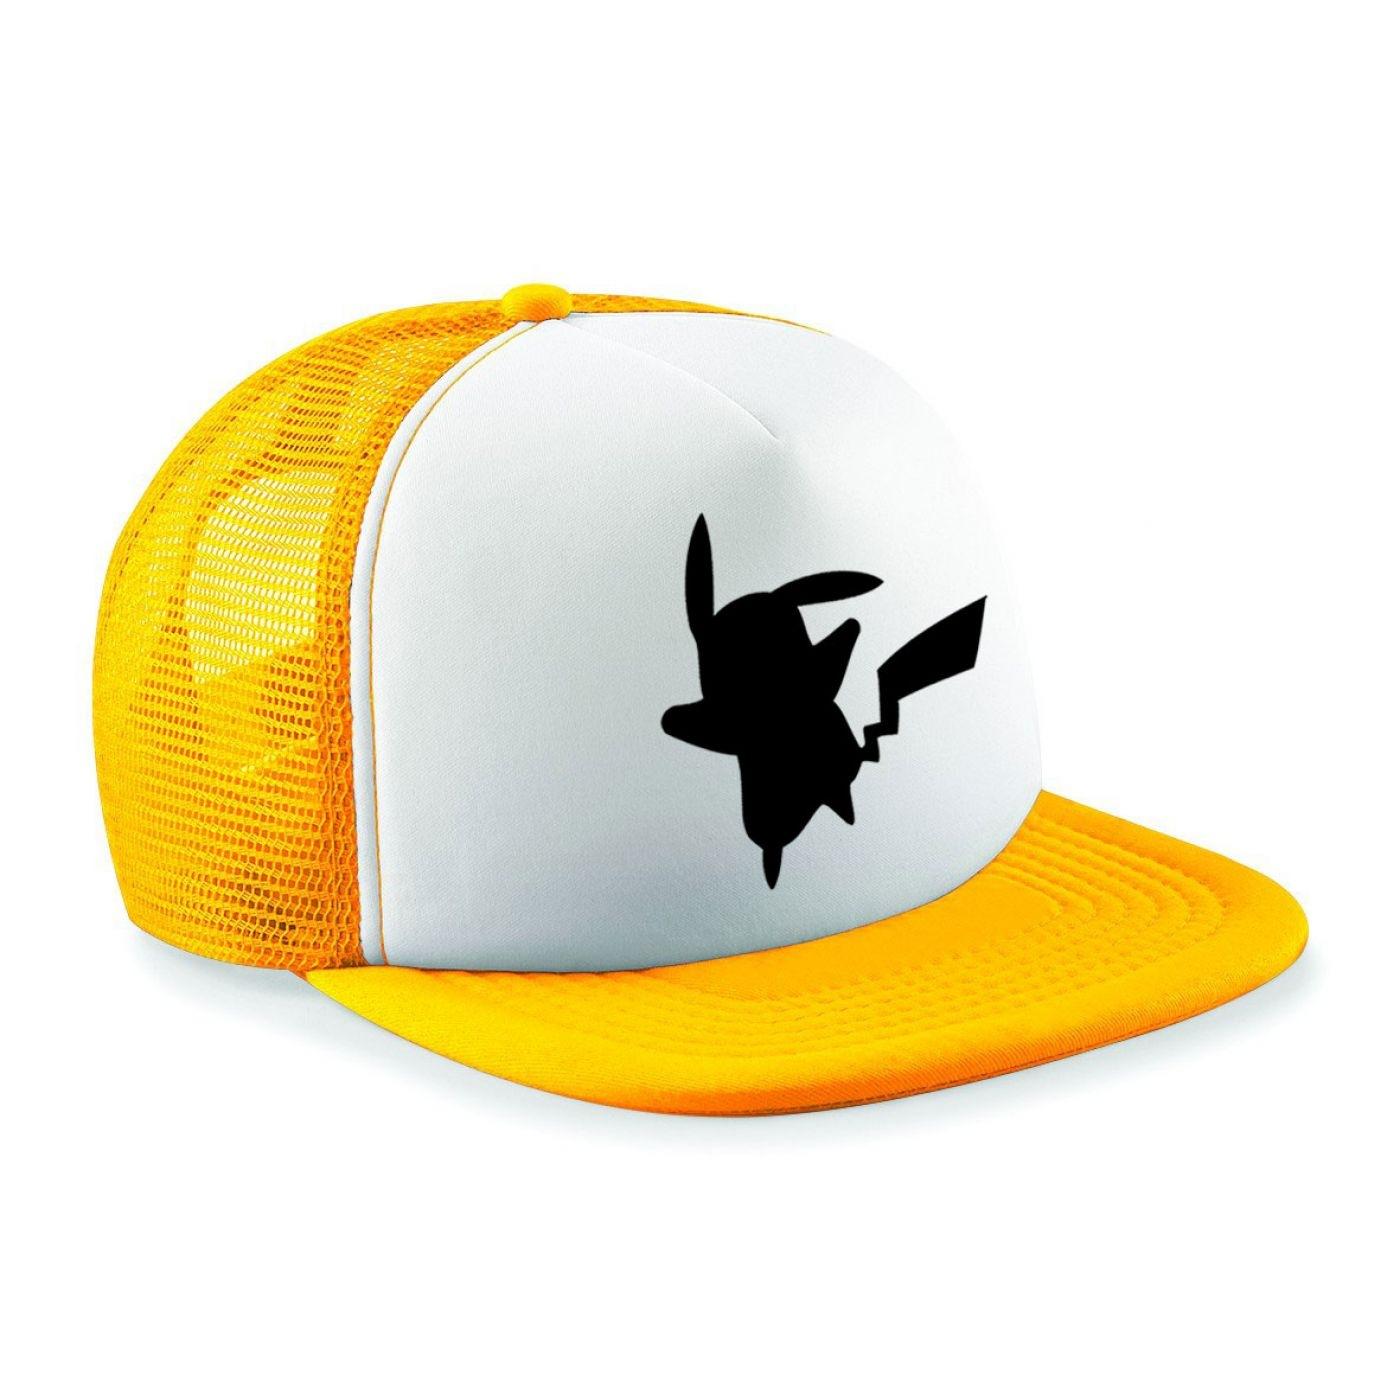 Pikachu Silhouette baseball cap